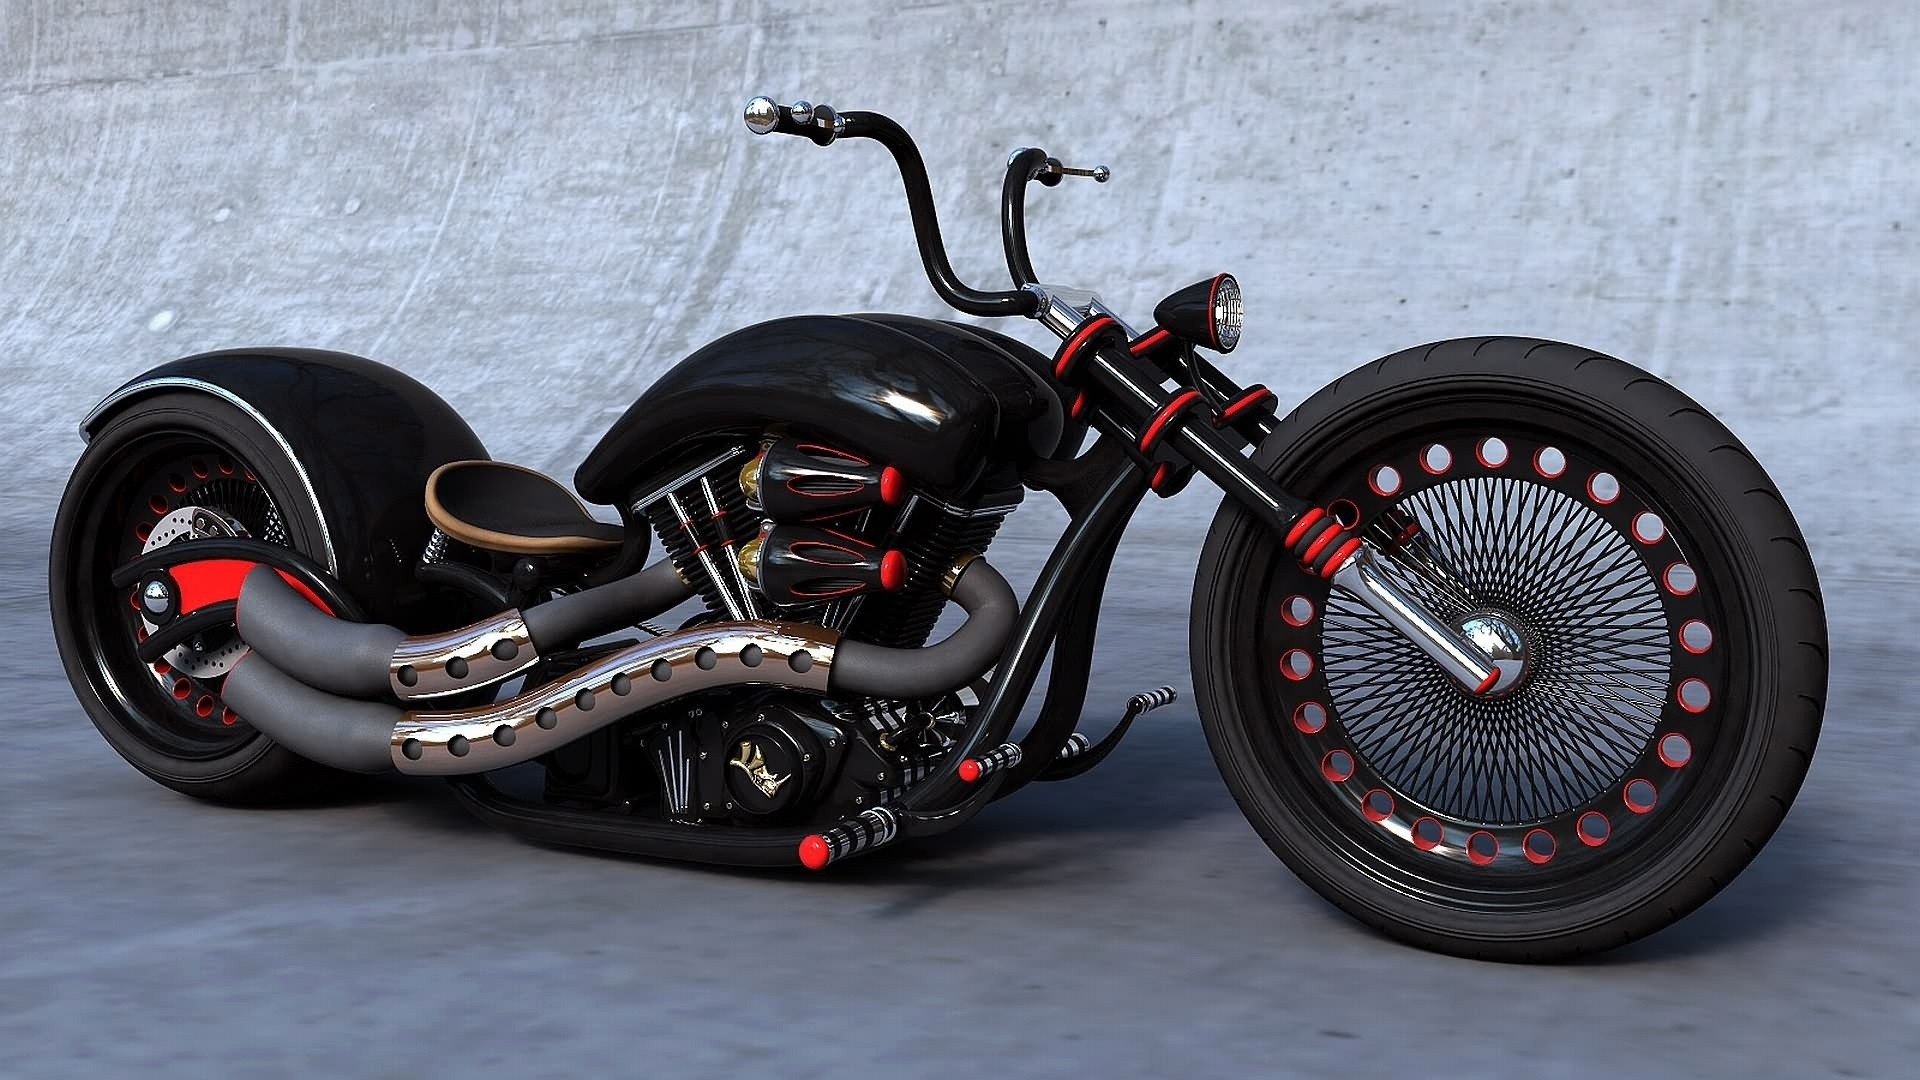 Bike  № 1580632 загрузить